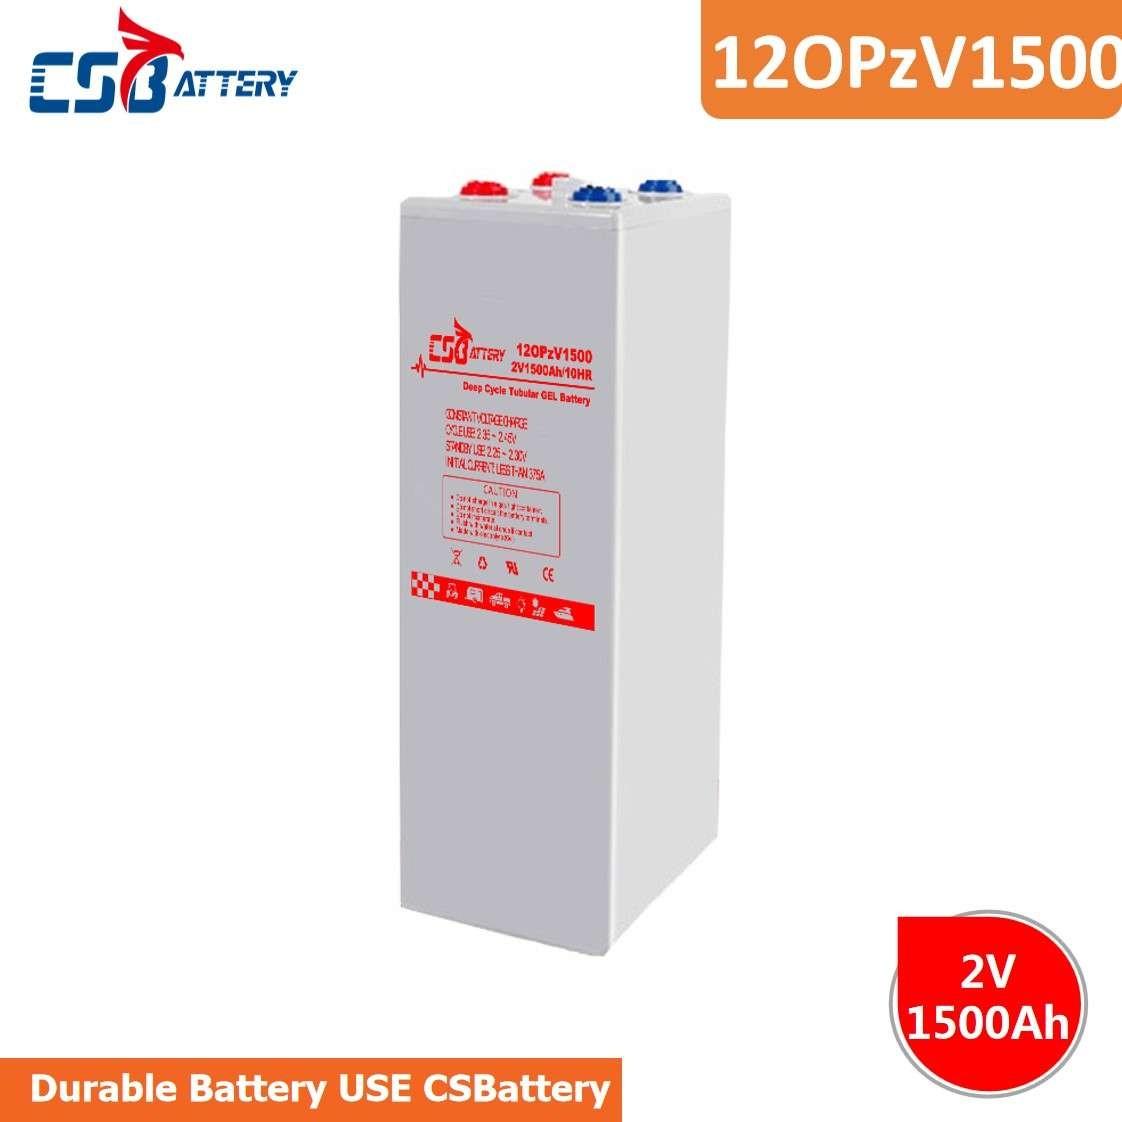 CSBattery 2V1500Ah后备能量深循环电池,用于高尔夫球车/电信/铁路/电动踏板车/助力泵